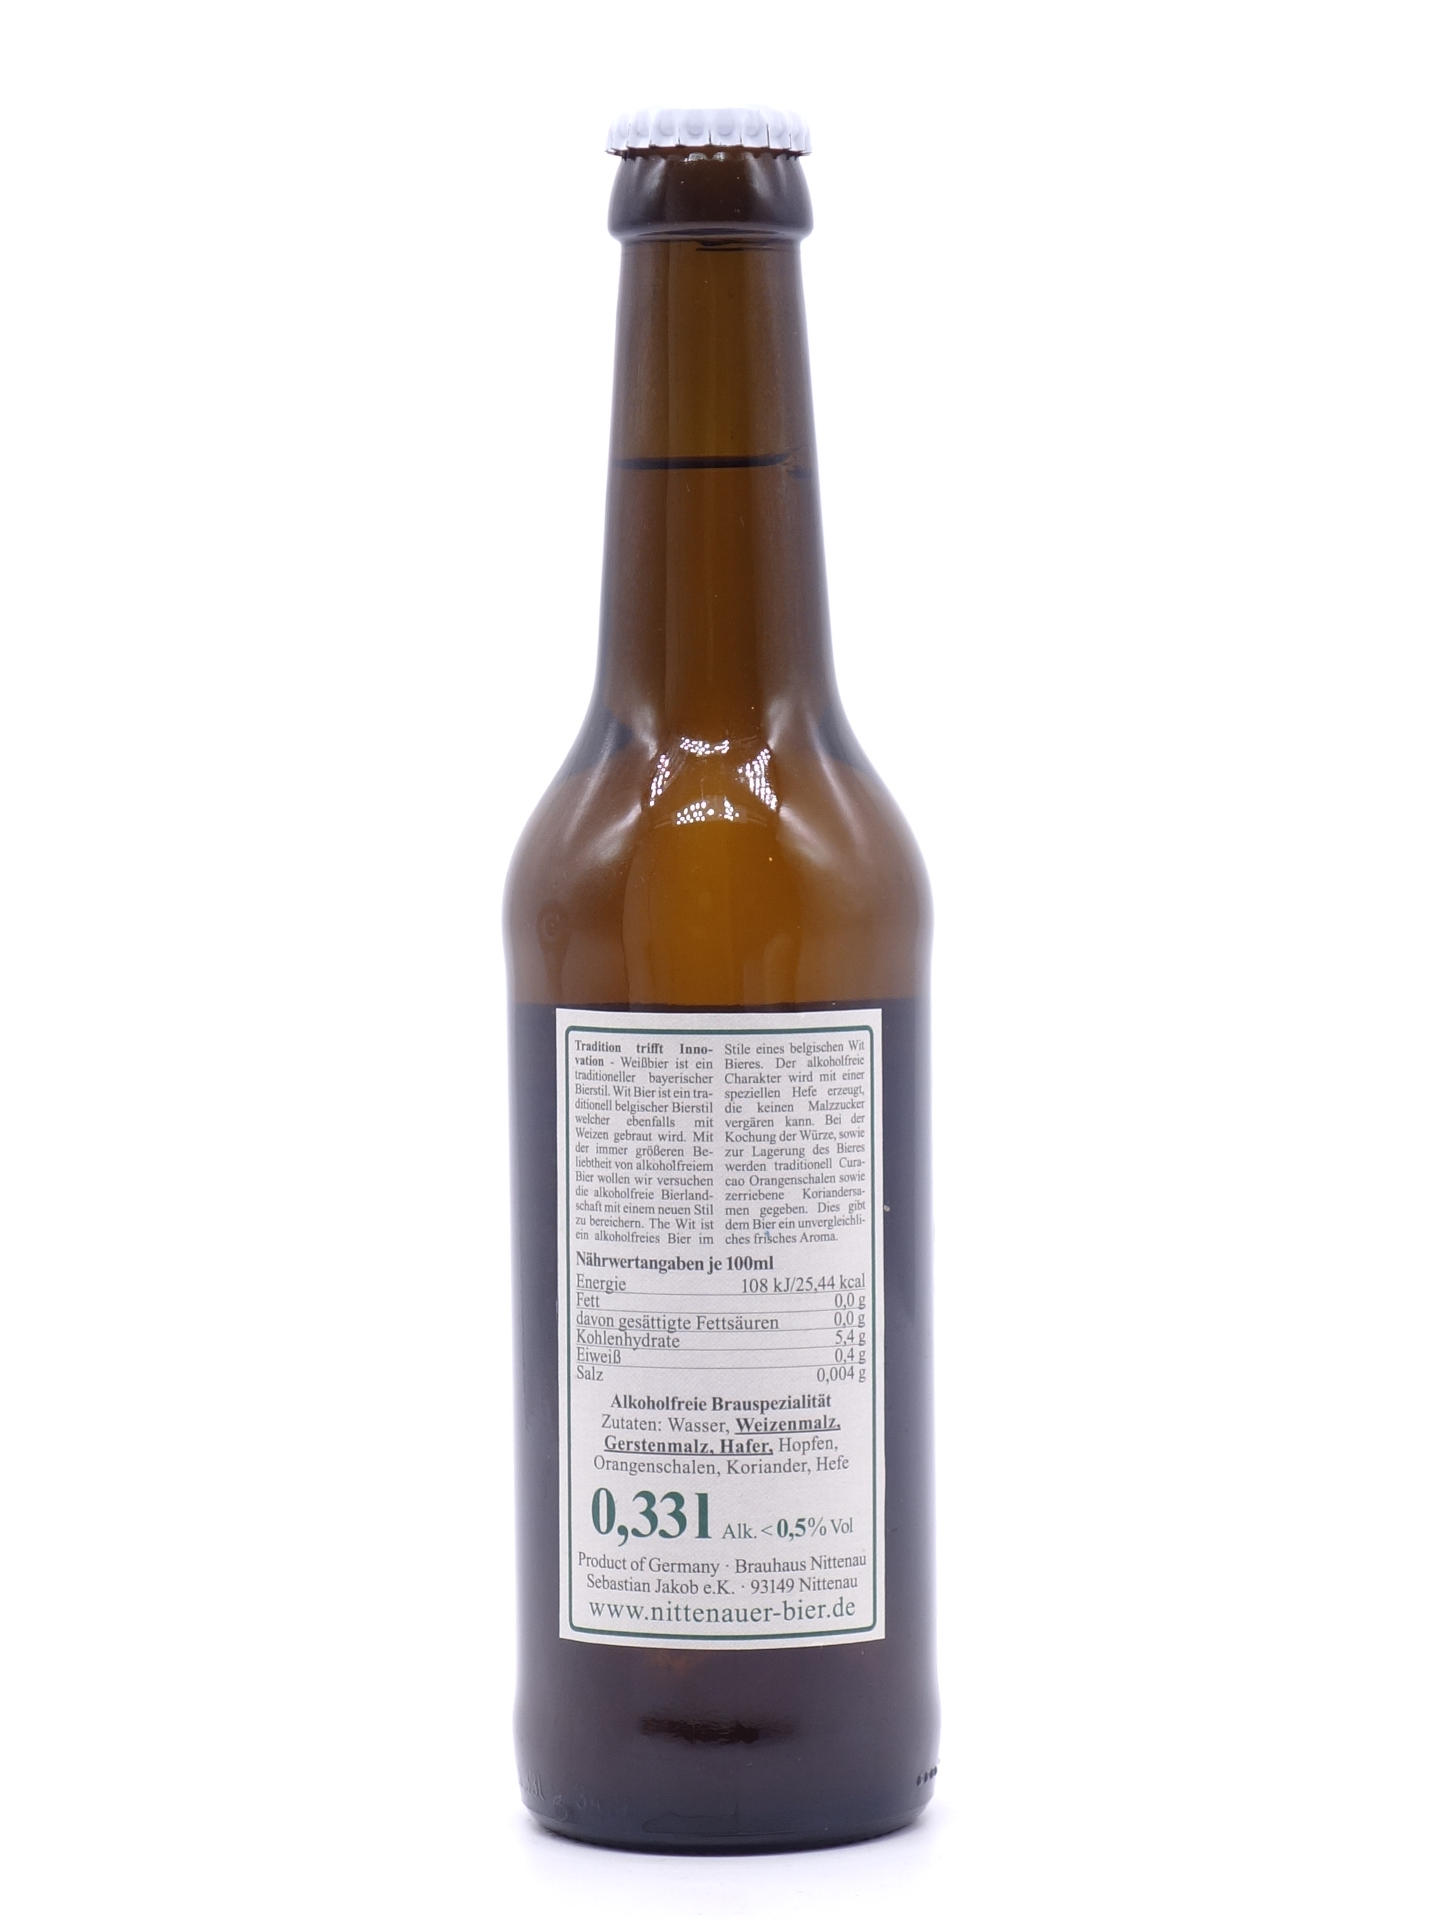 Nittenauer Bier